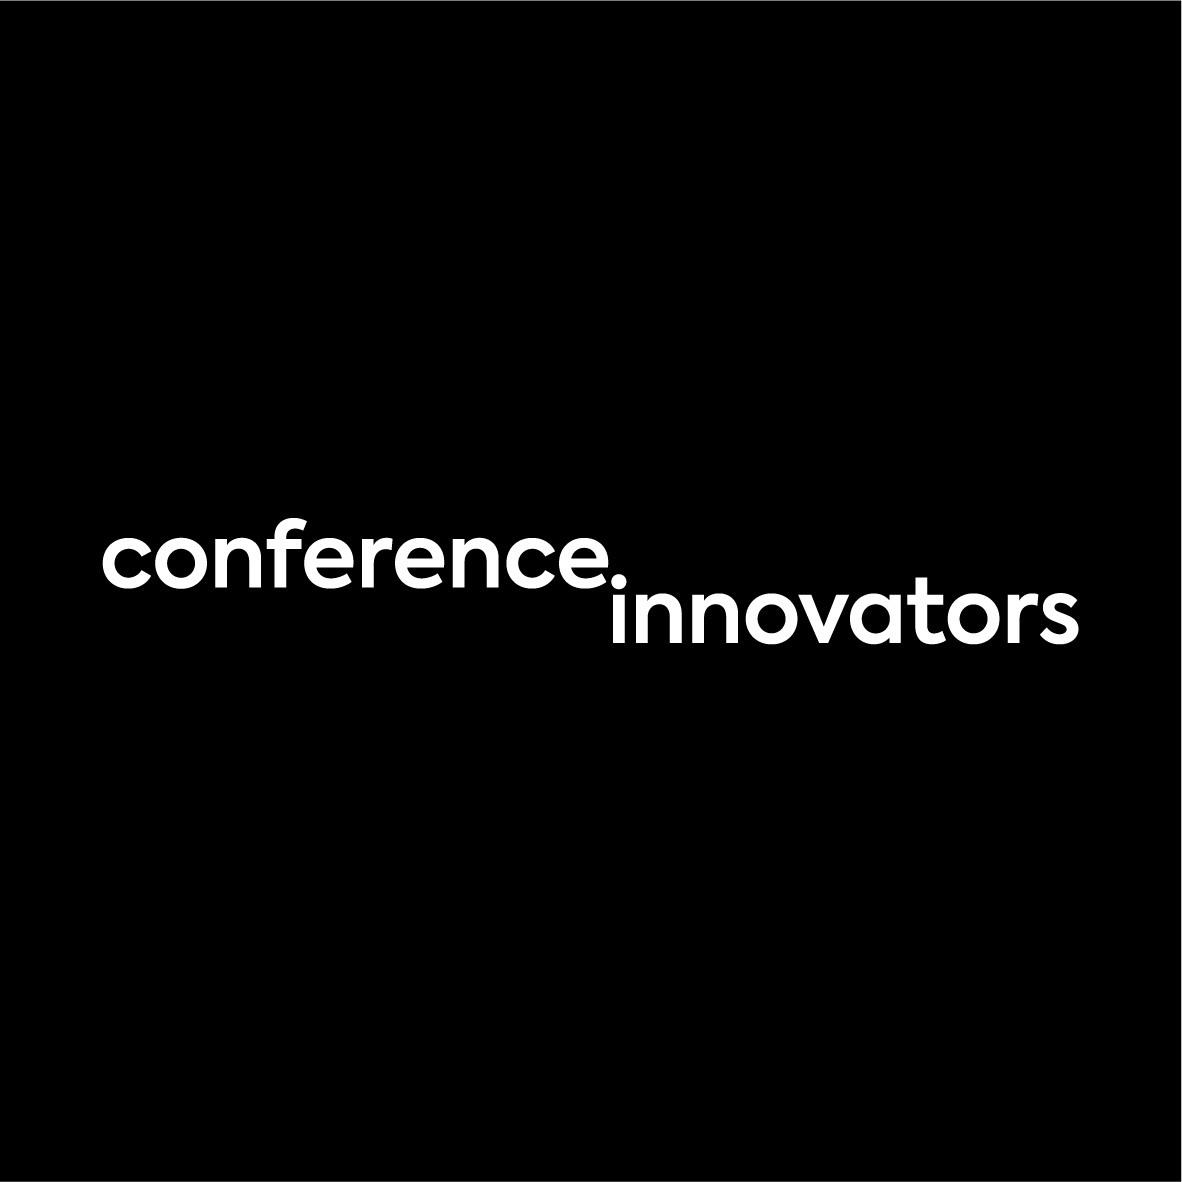 NZDA — New Zealand Dental Association Conference & Exhibition